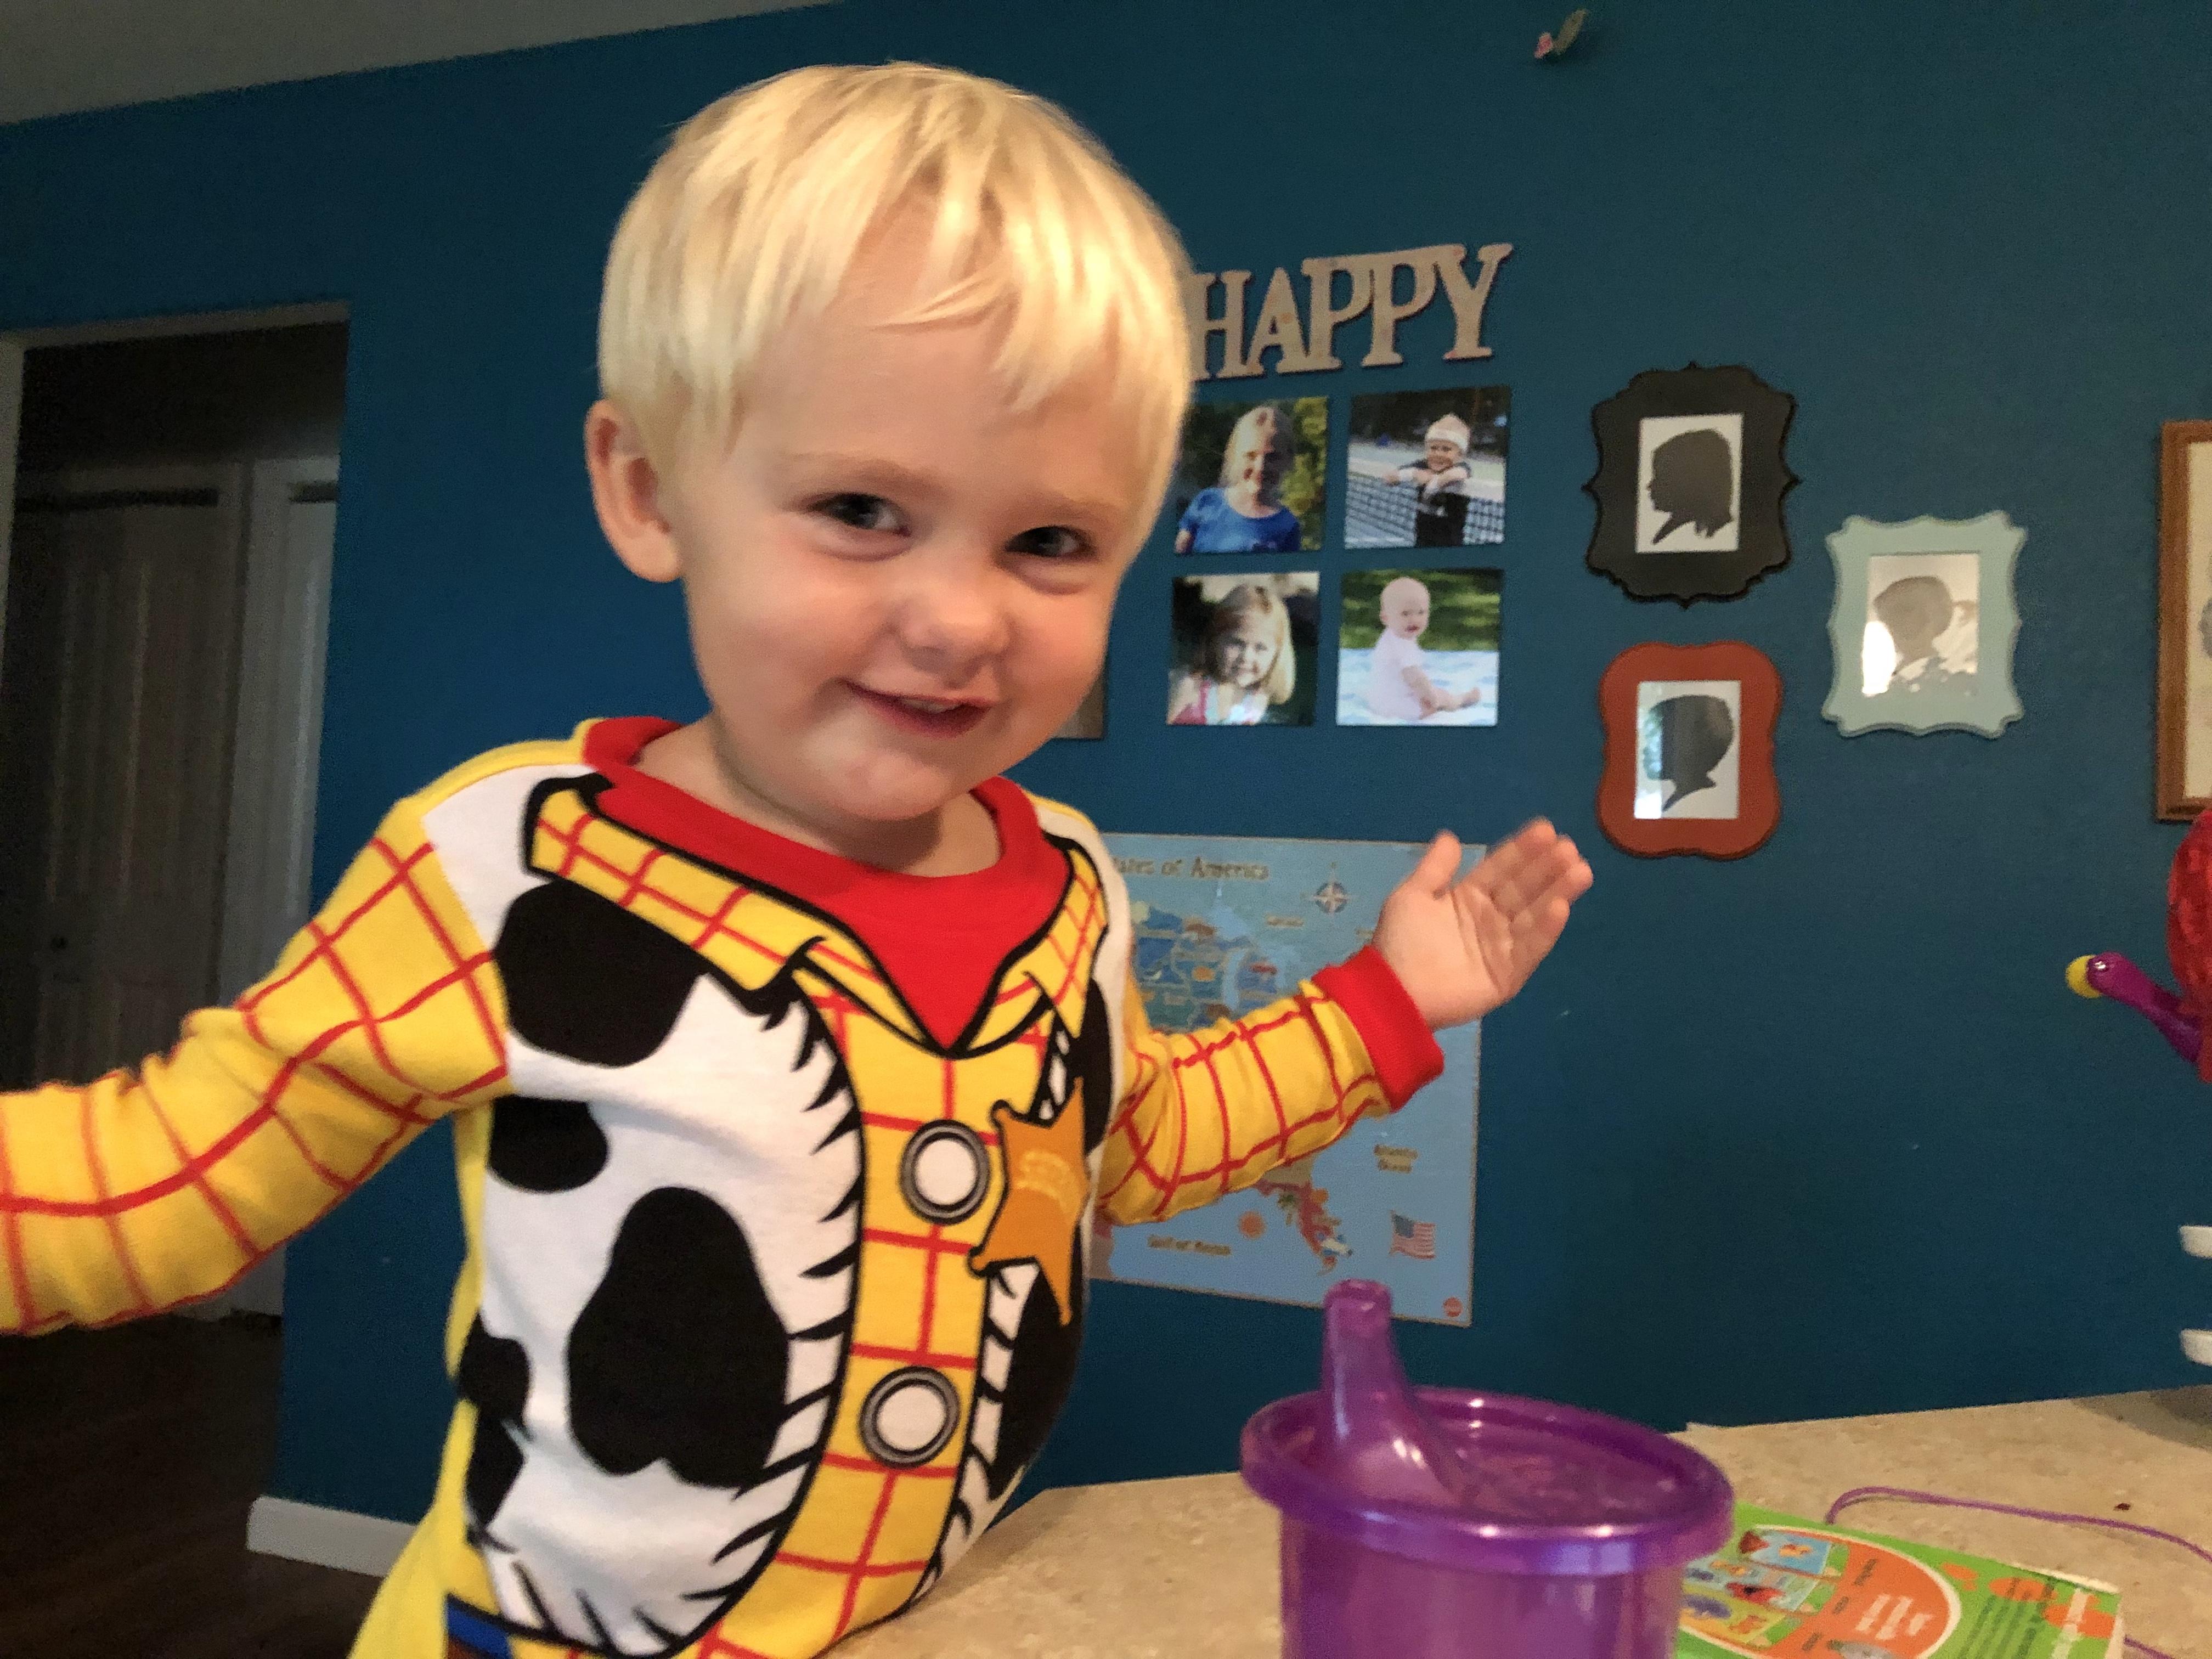 Toddler smiling at table